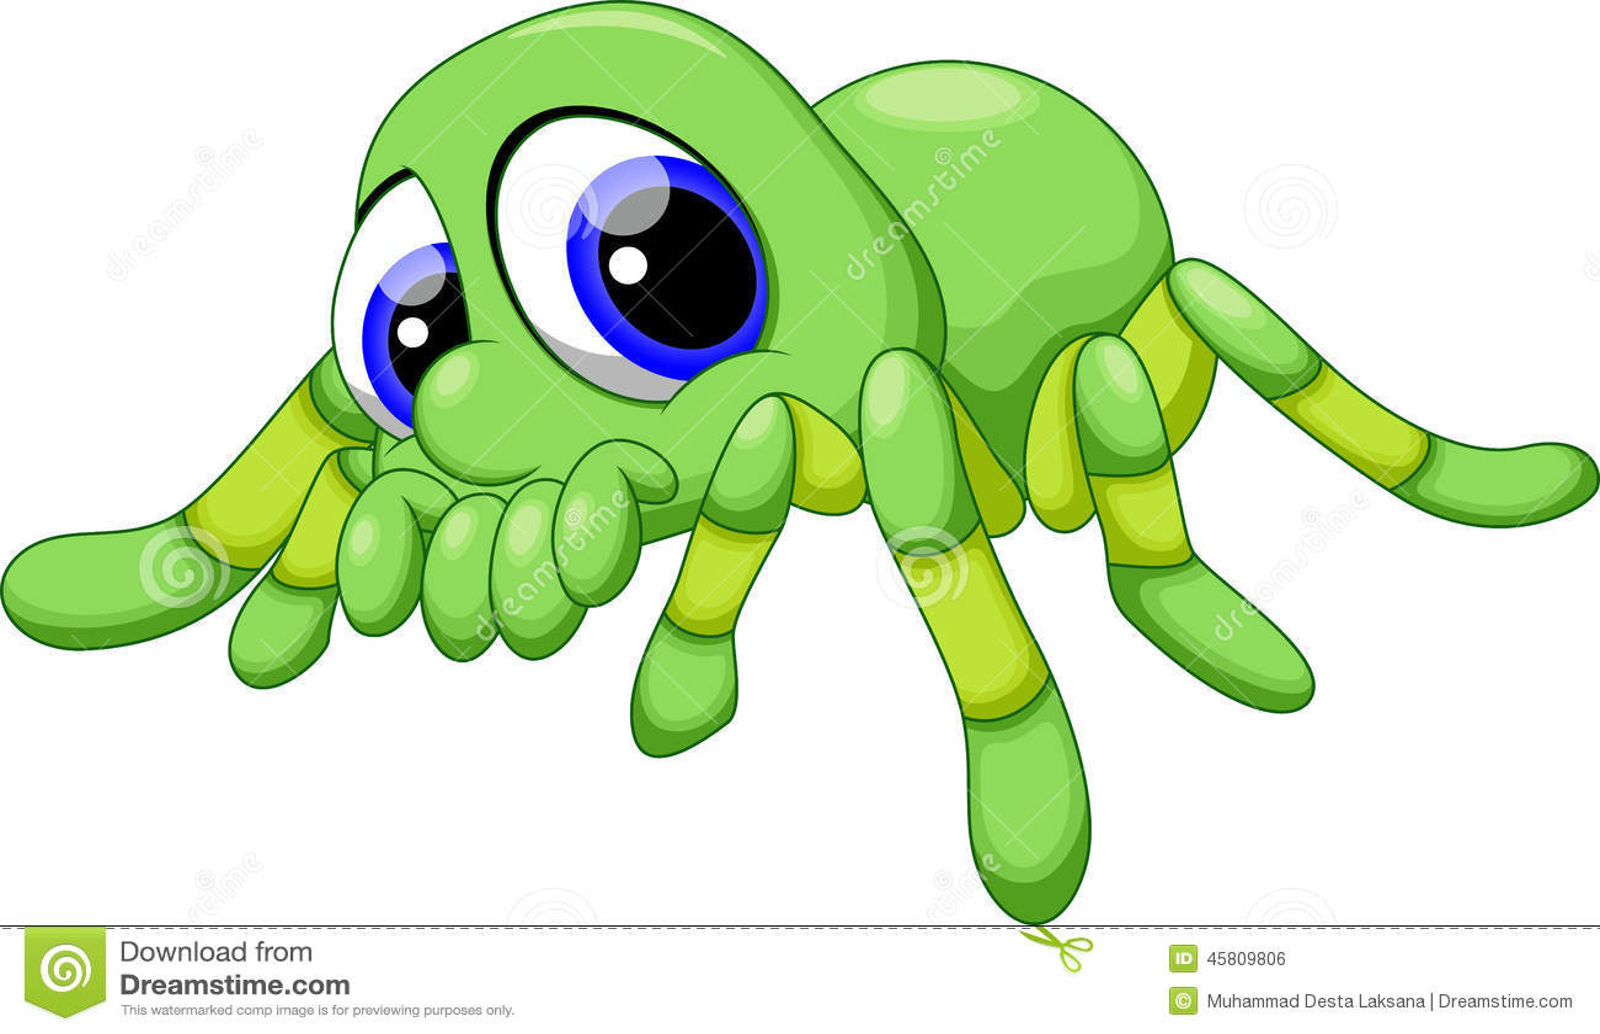 Cute Baby Tarantula Cartoon Stock Illustration - Image ...